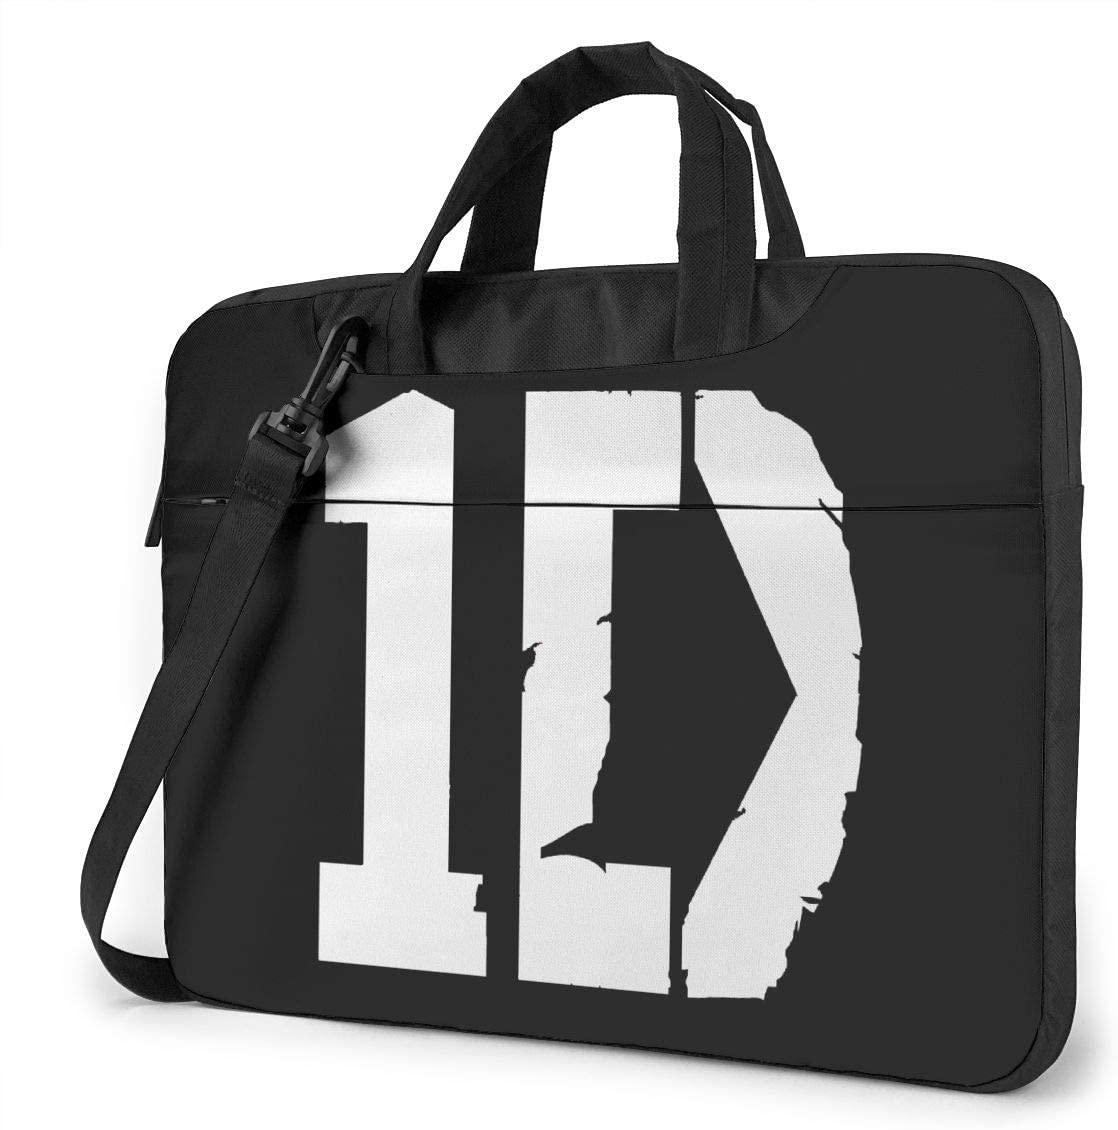 On-e Di-rect-ion Laptop Bag 15.6/14/13in Notebook Briefcase Handbag PC Tablet Protective Case